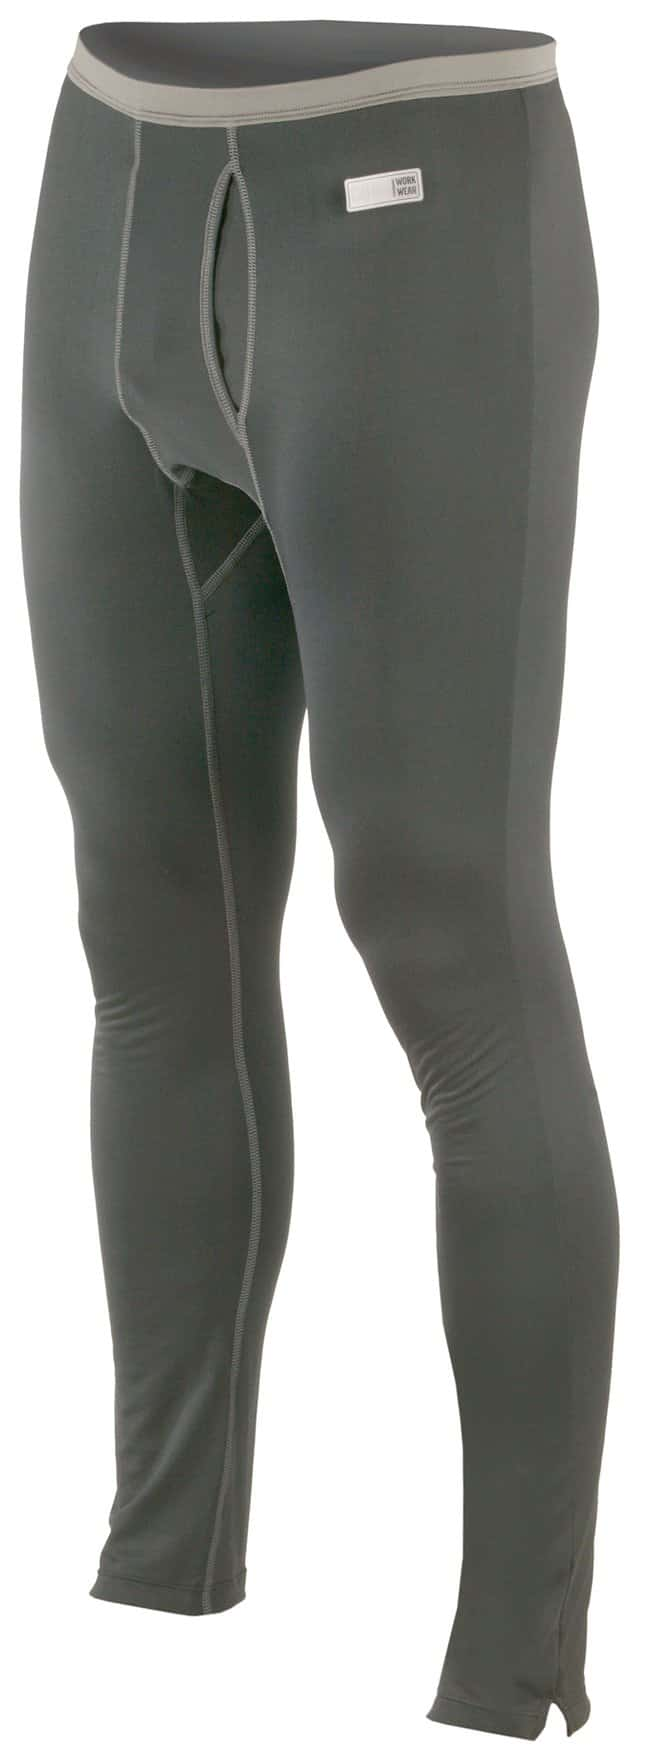 Ergodyne™ CORE Performance Work Wear™ Bottoms